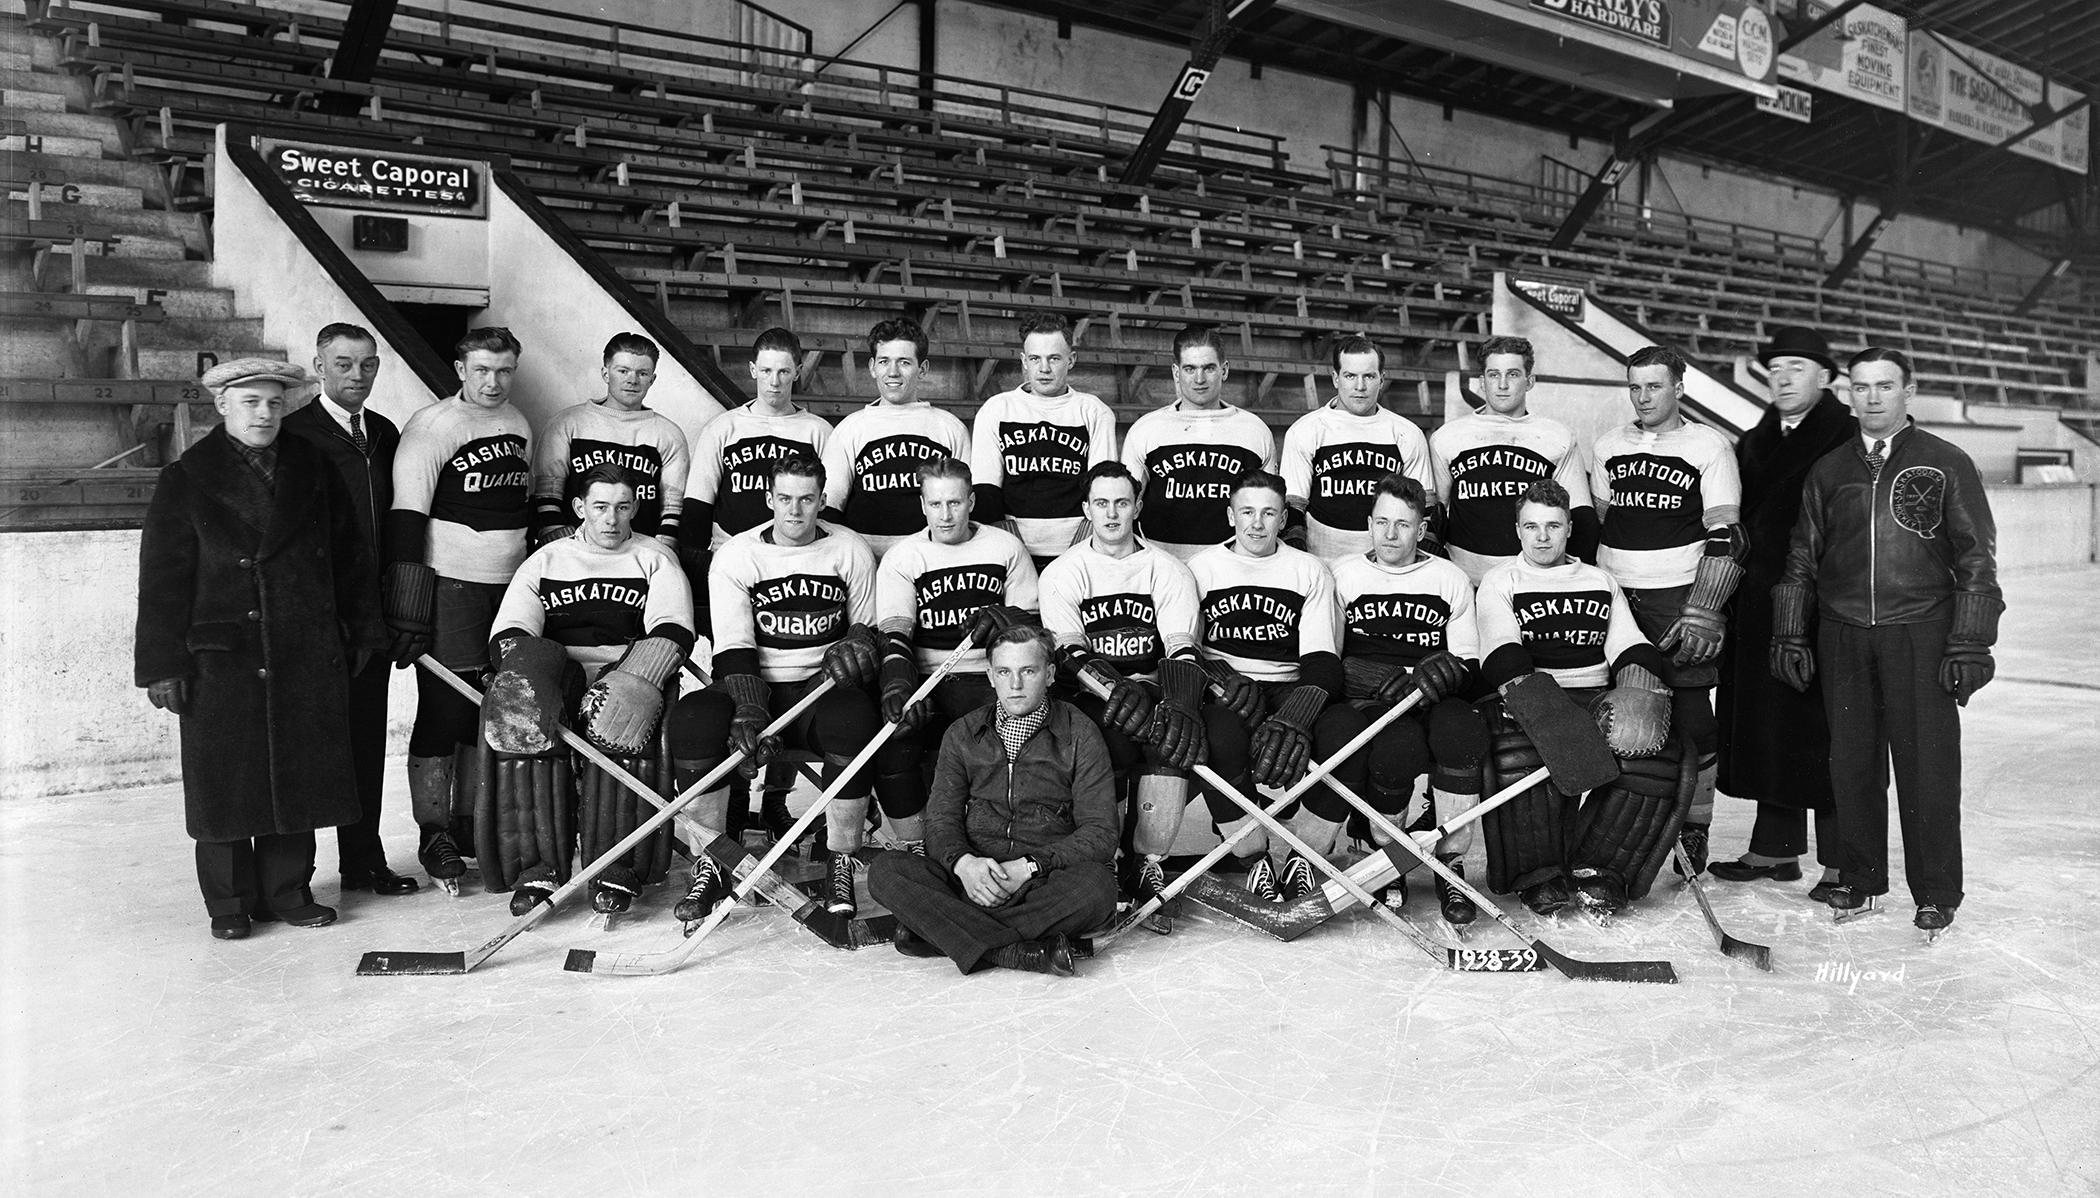 The (mostly) unsmiling members of the 1938-39 Saskatoon Quakers minor-pro hockey team inside Saskatoon Arena. (Saskatoon Public Library Local History Room - Photo A-661)